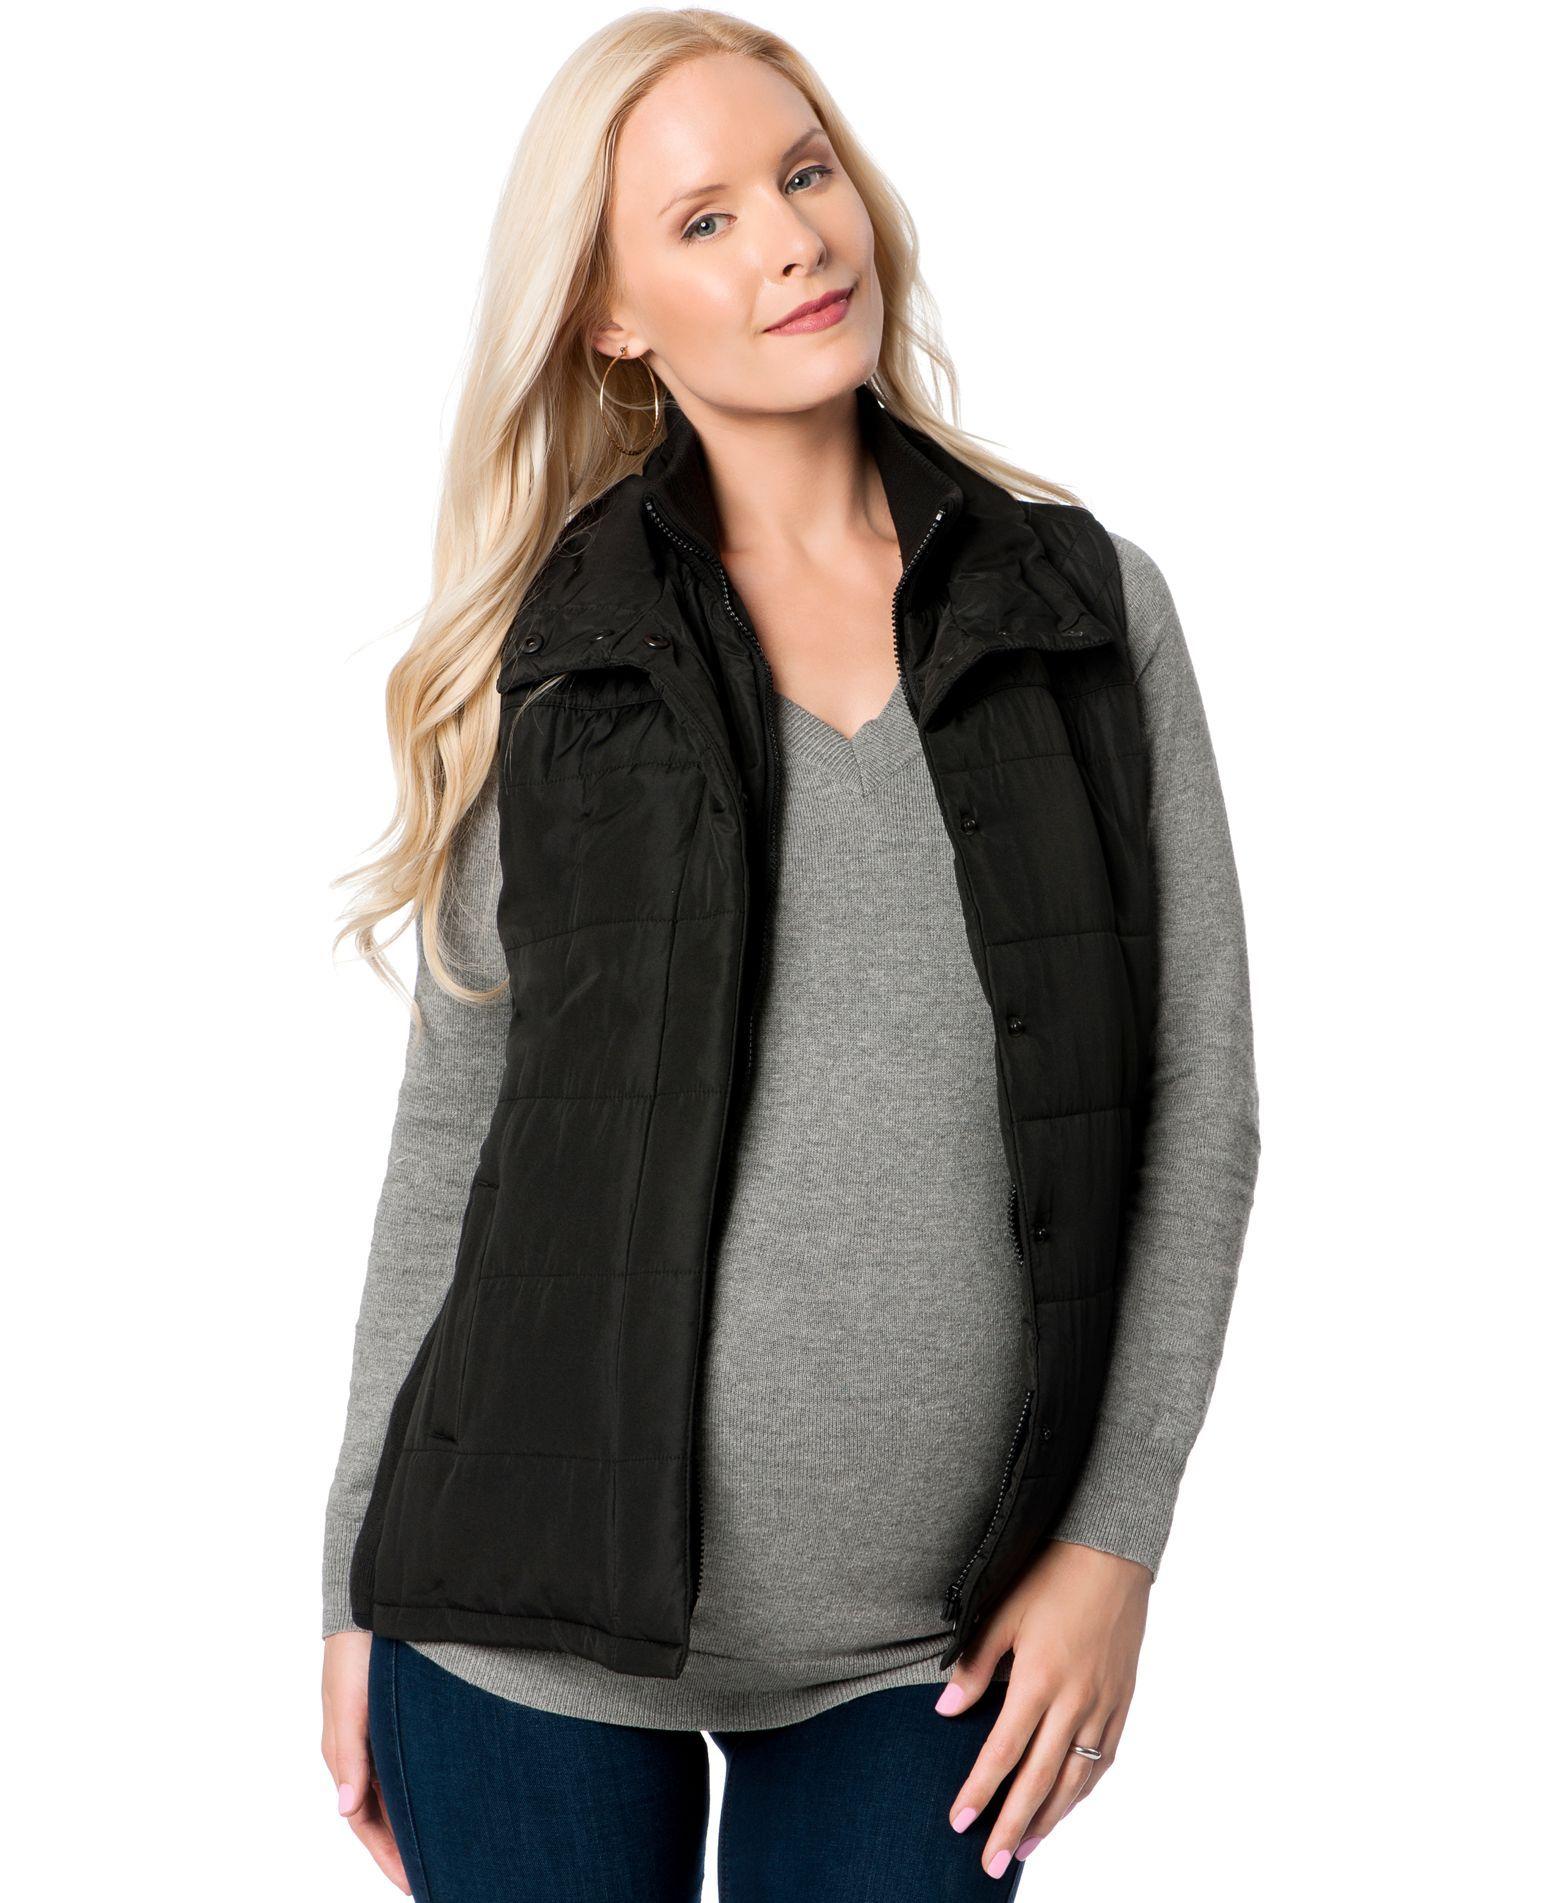 bef0c3b534324 Motherhood Maternity Puffer Vest   Products   Maternity vests, Vest ...